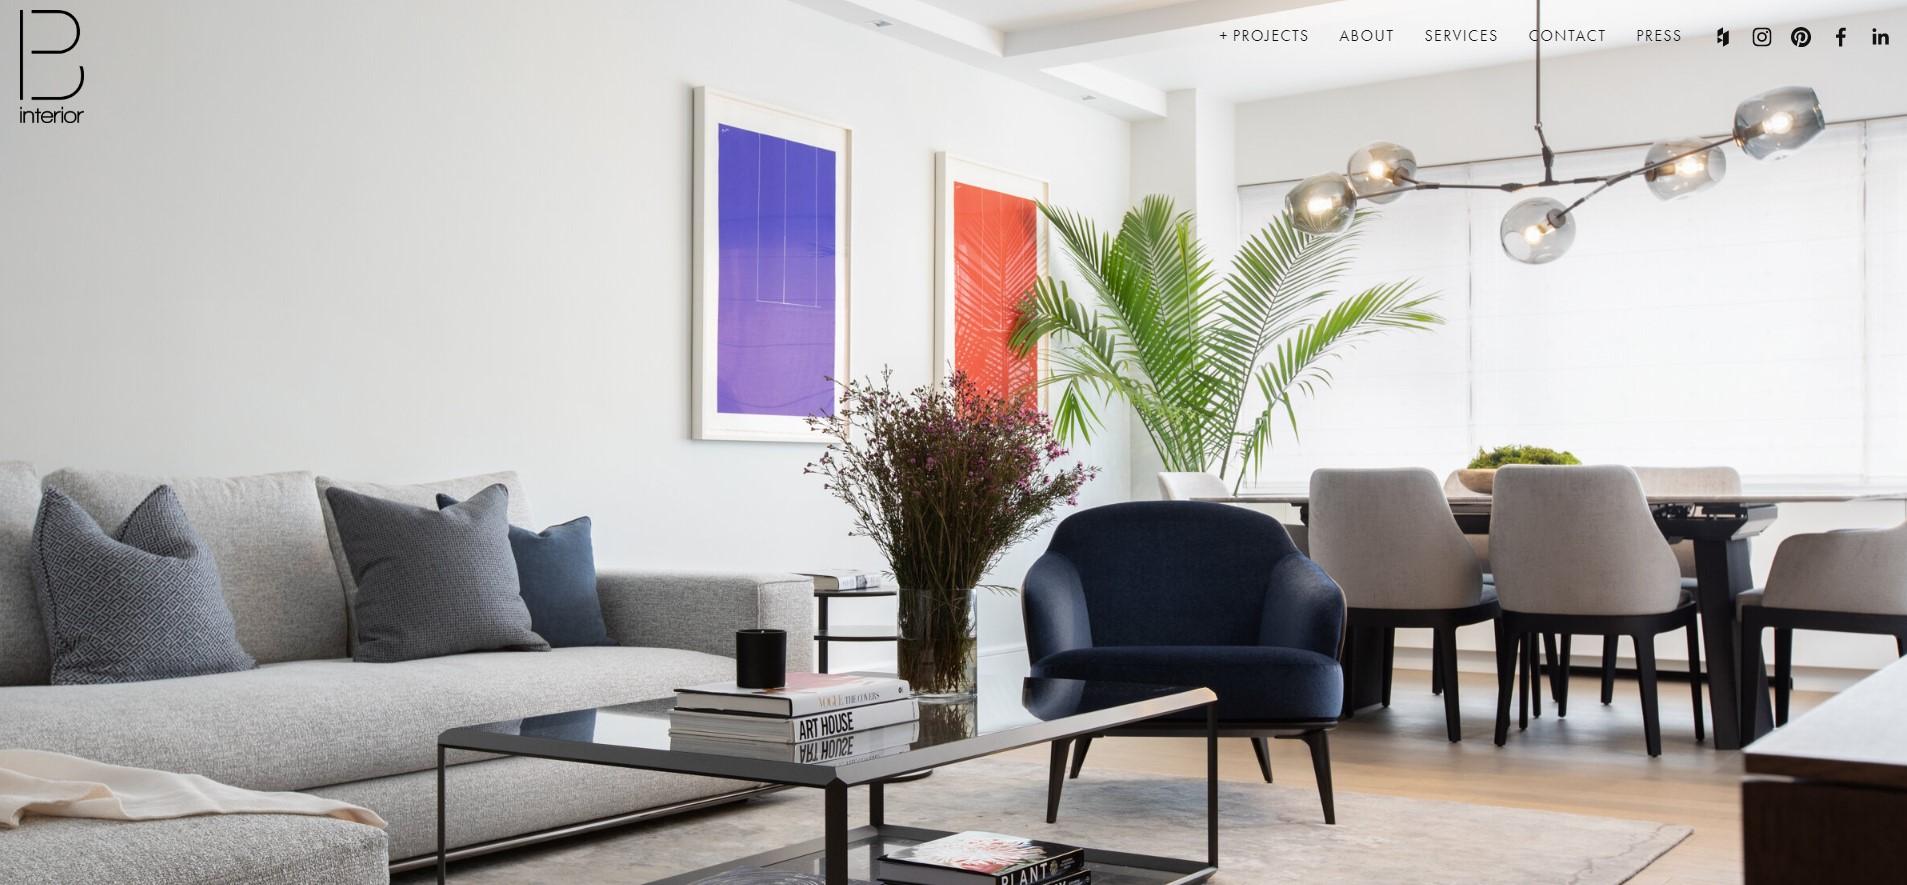 b interior designer in new york